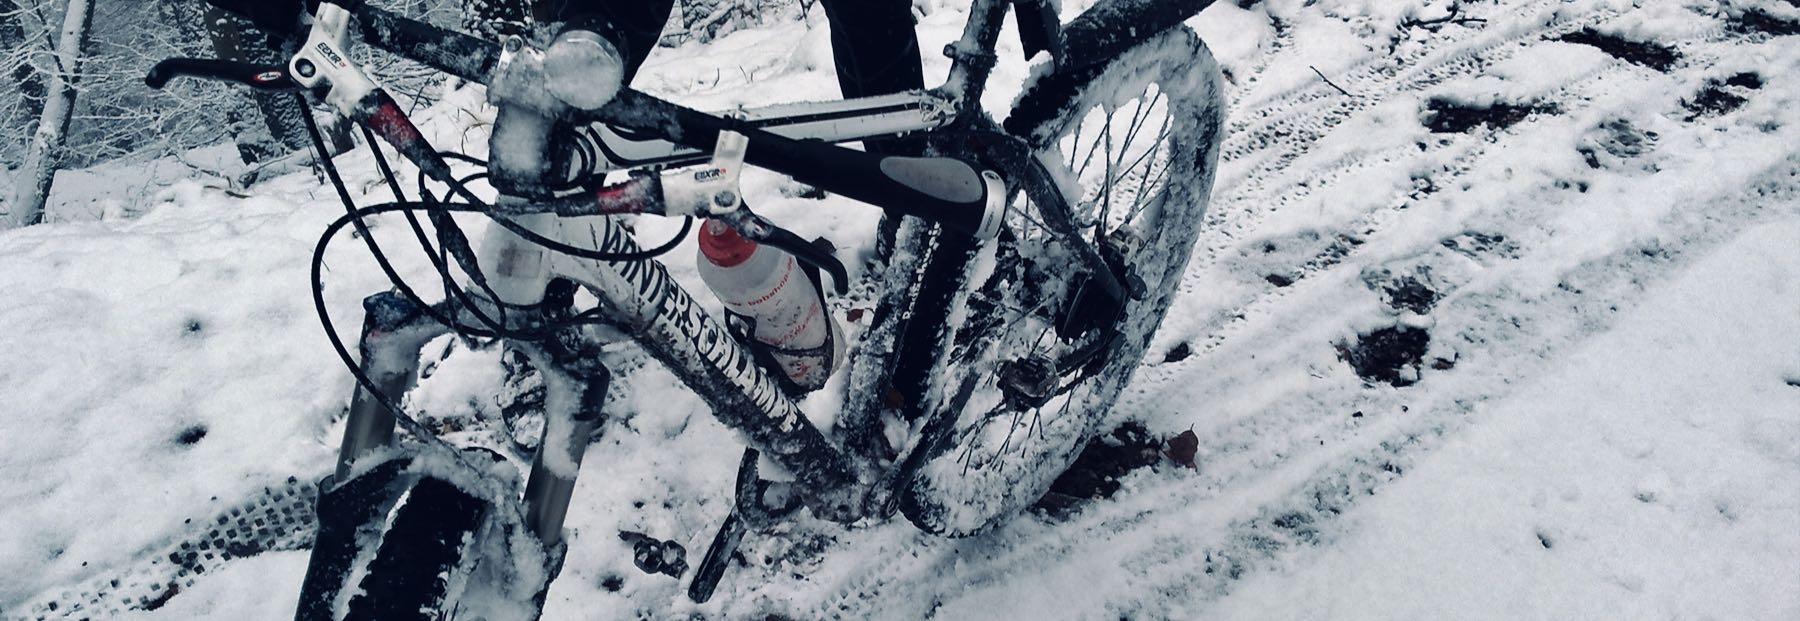 Winterpokal 2018/2019 Image